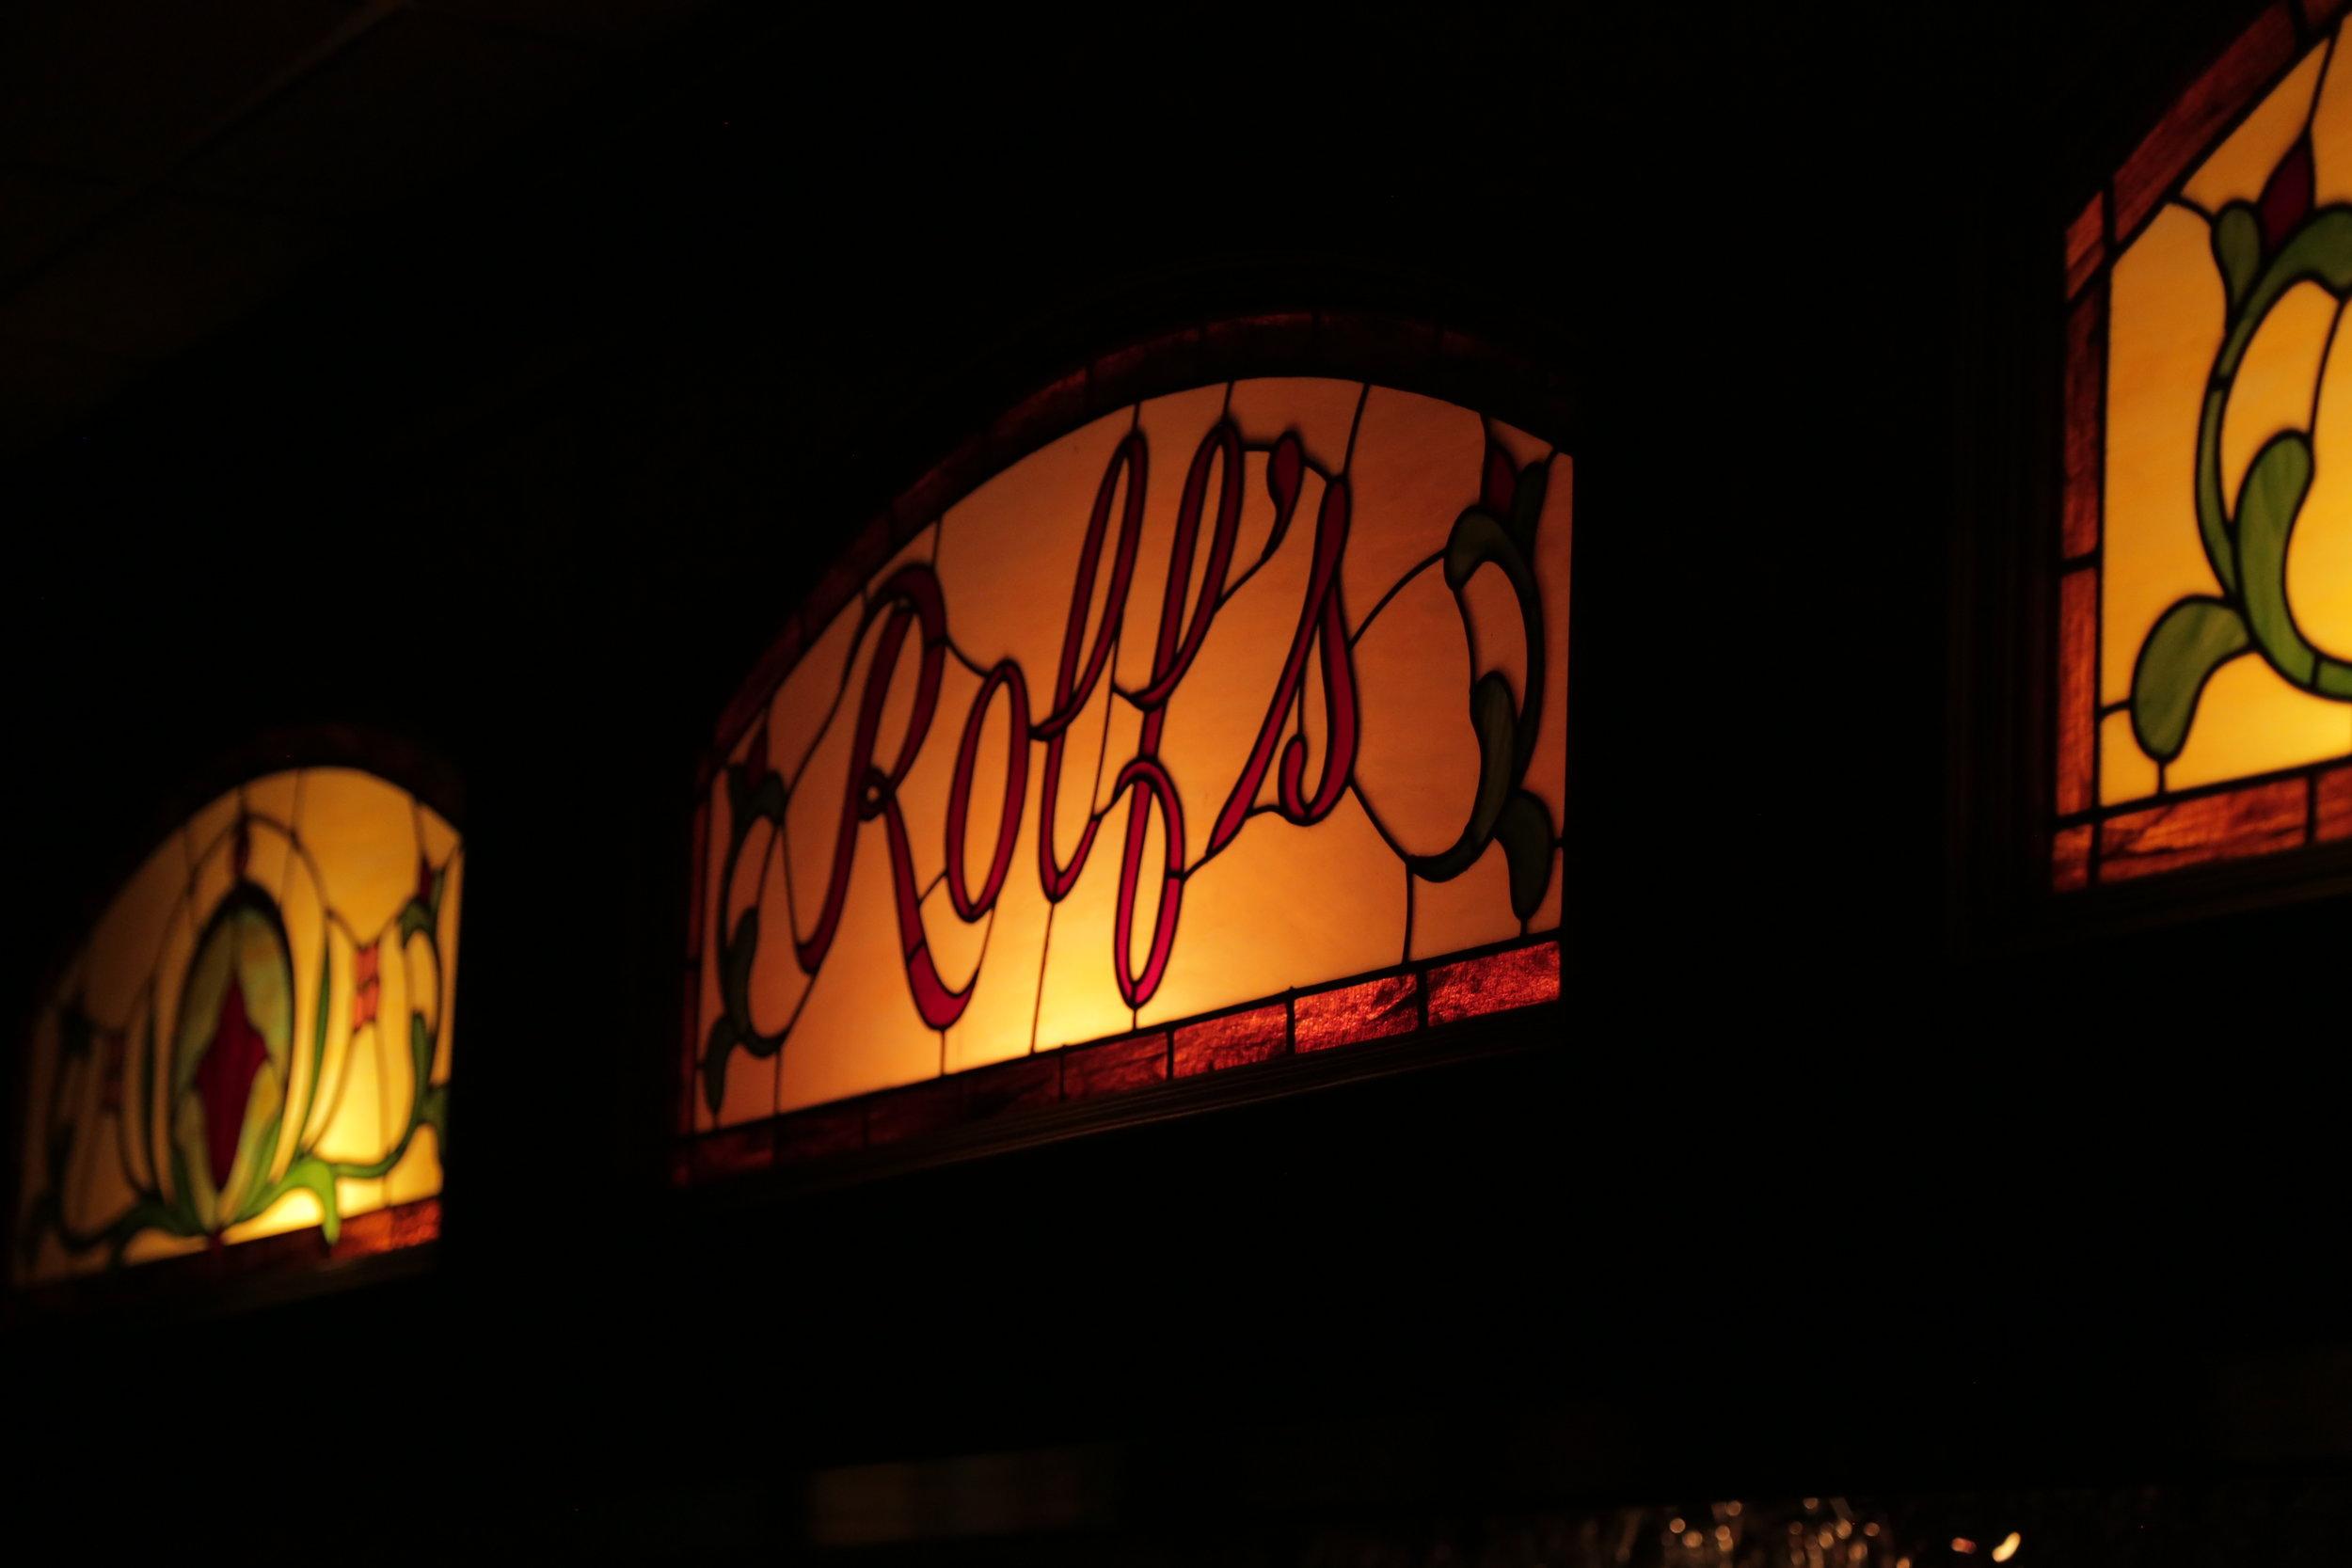 Rolf's Restaurant & Pub